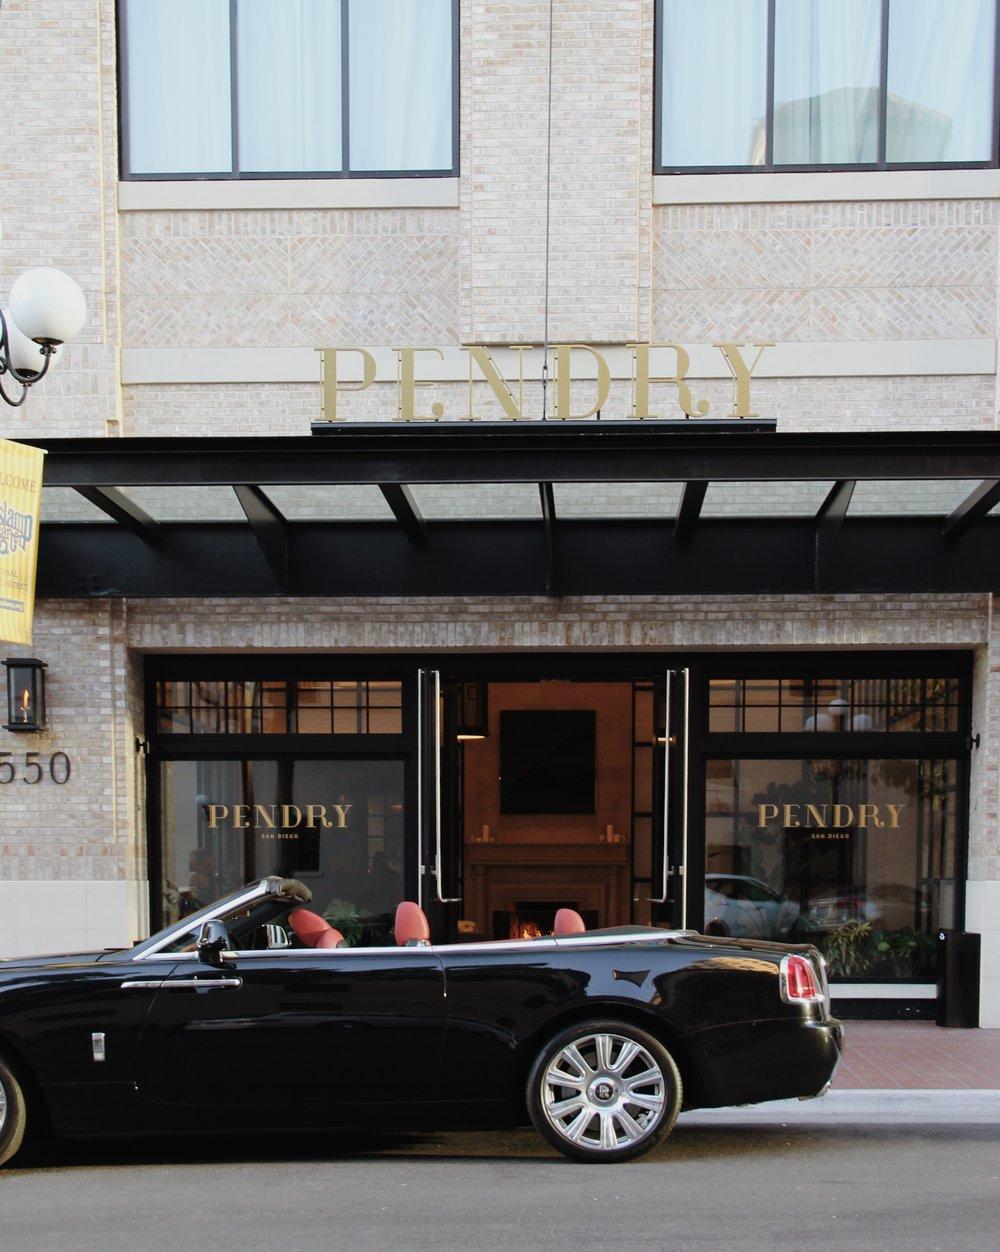 Pendry Hotel San Diego | ©Life & Food